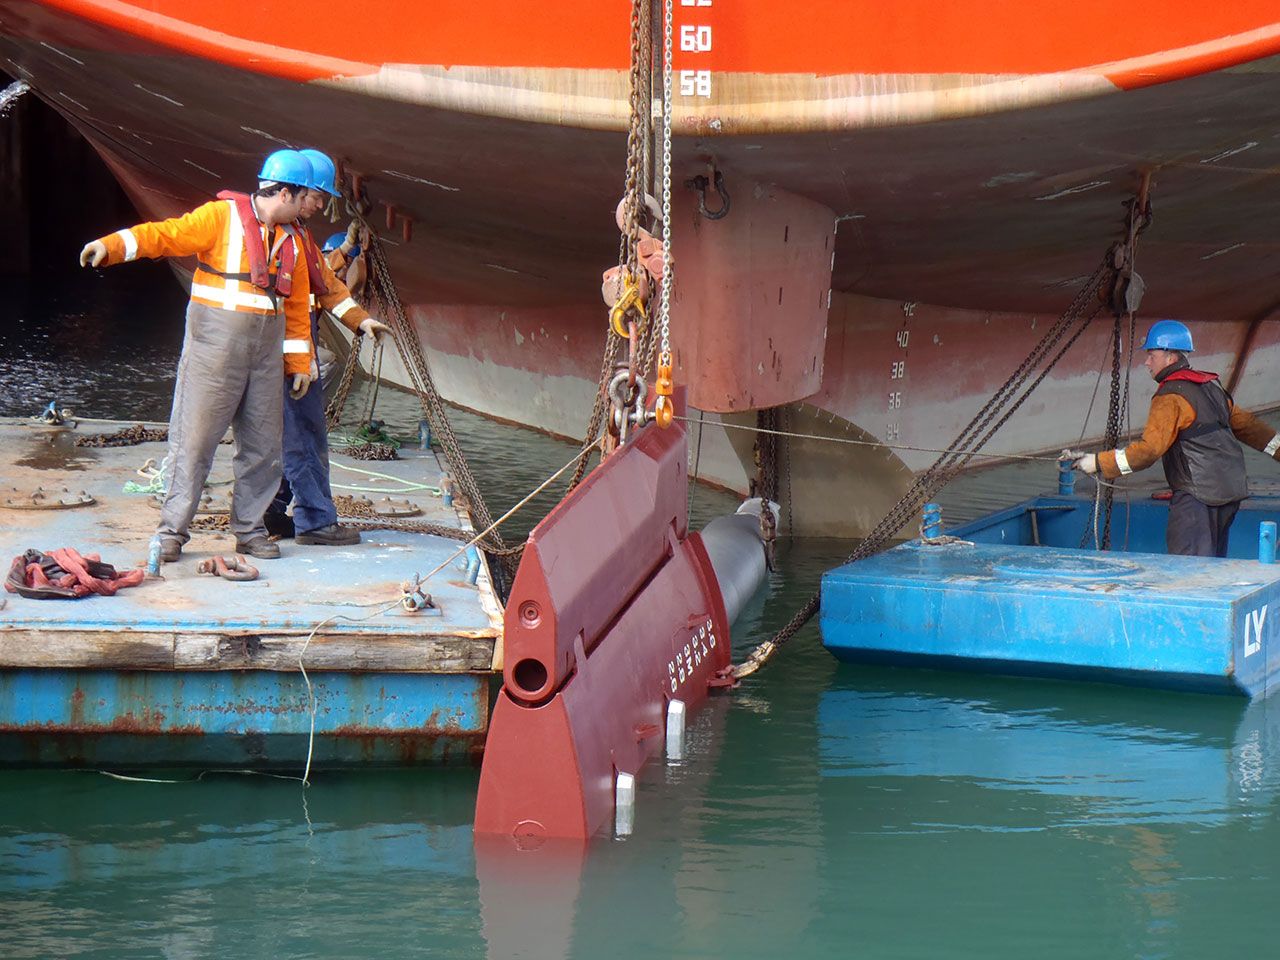 Freighter - Spirit of Resolution - rudder replacement